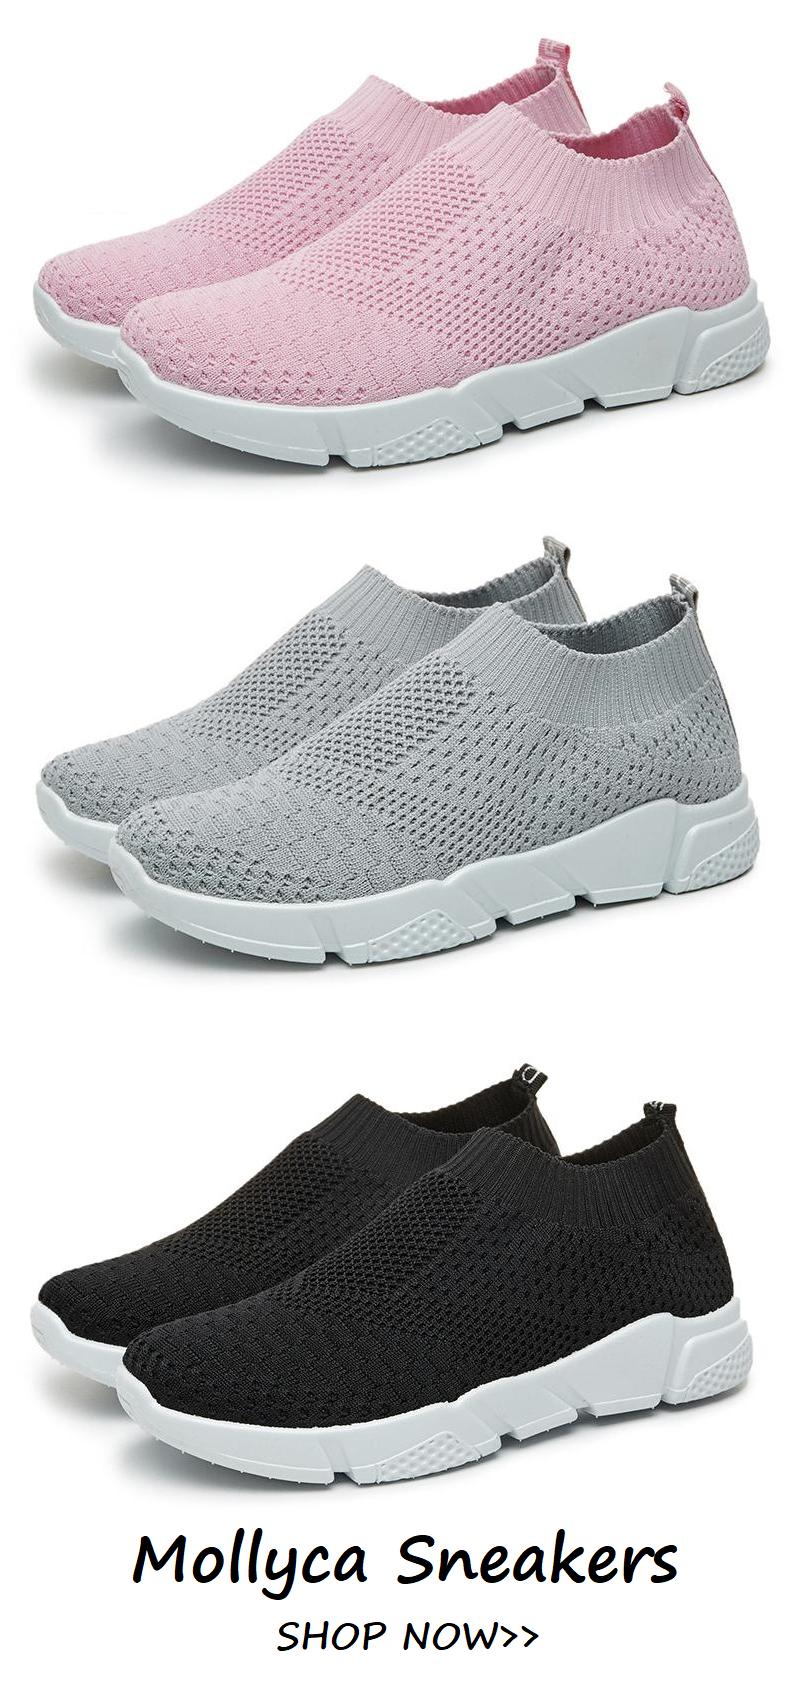 White All Season Elastic Cloth Sneaker Shoes in 2018  5745e8f55